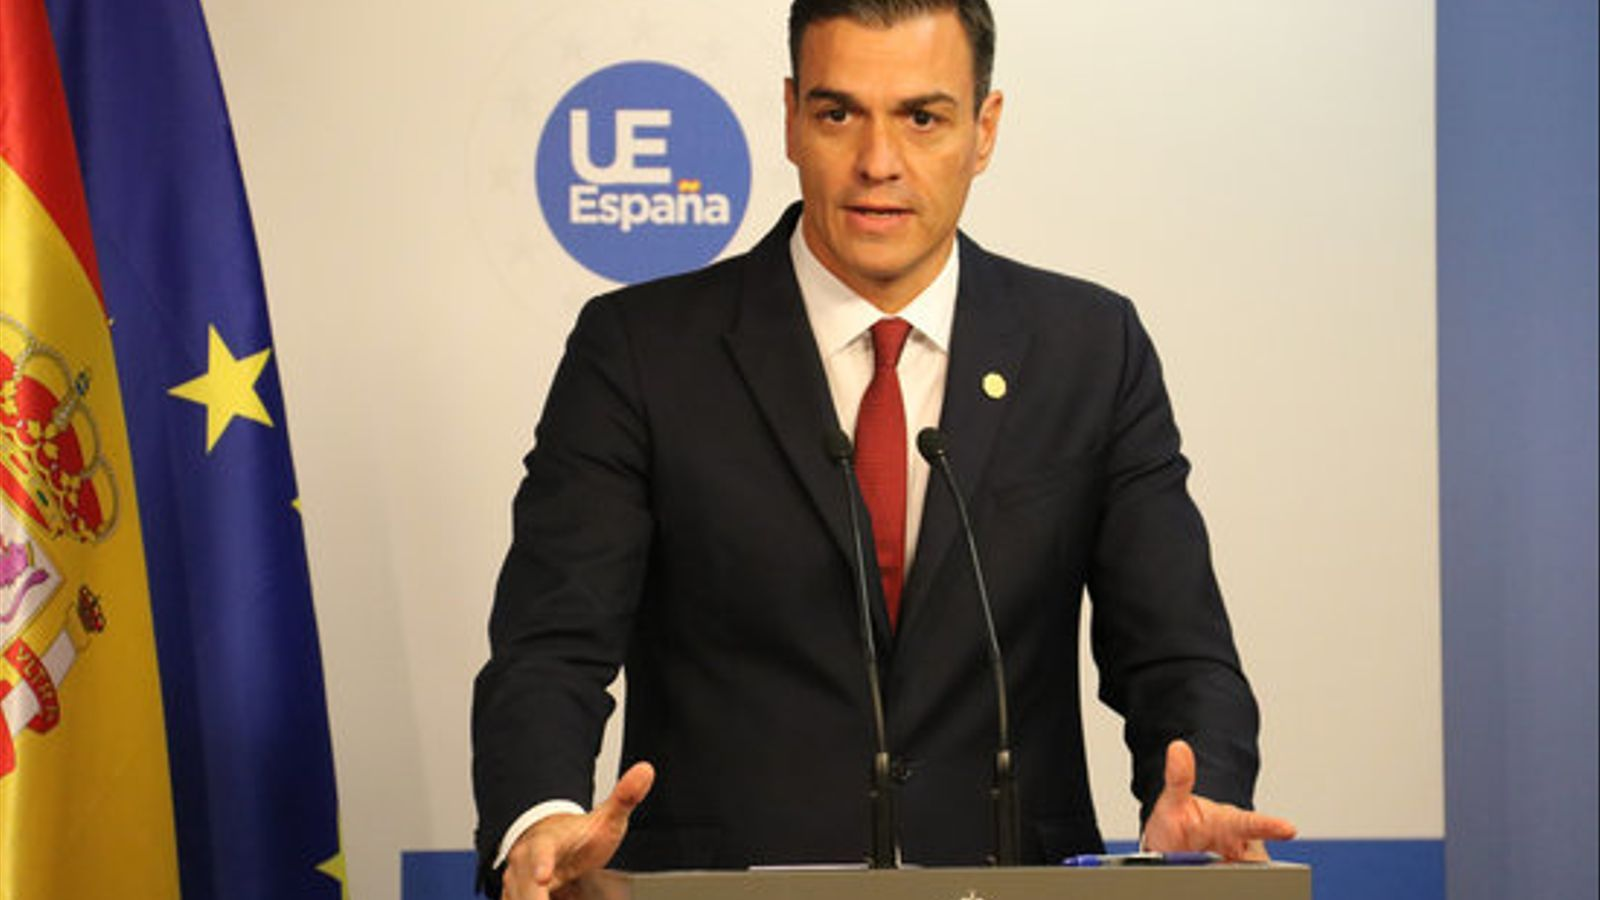 El president del govern espanyol, Pedro Sánchez, en roda de premsa des de Brussel·les